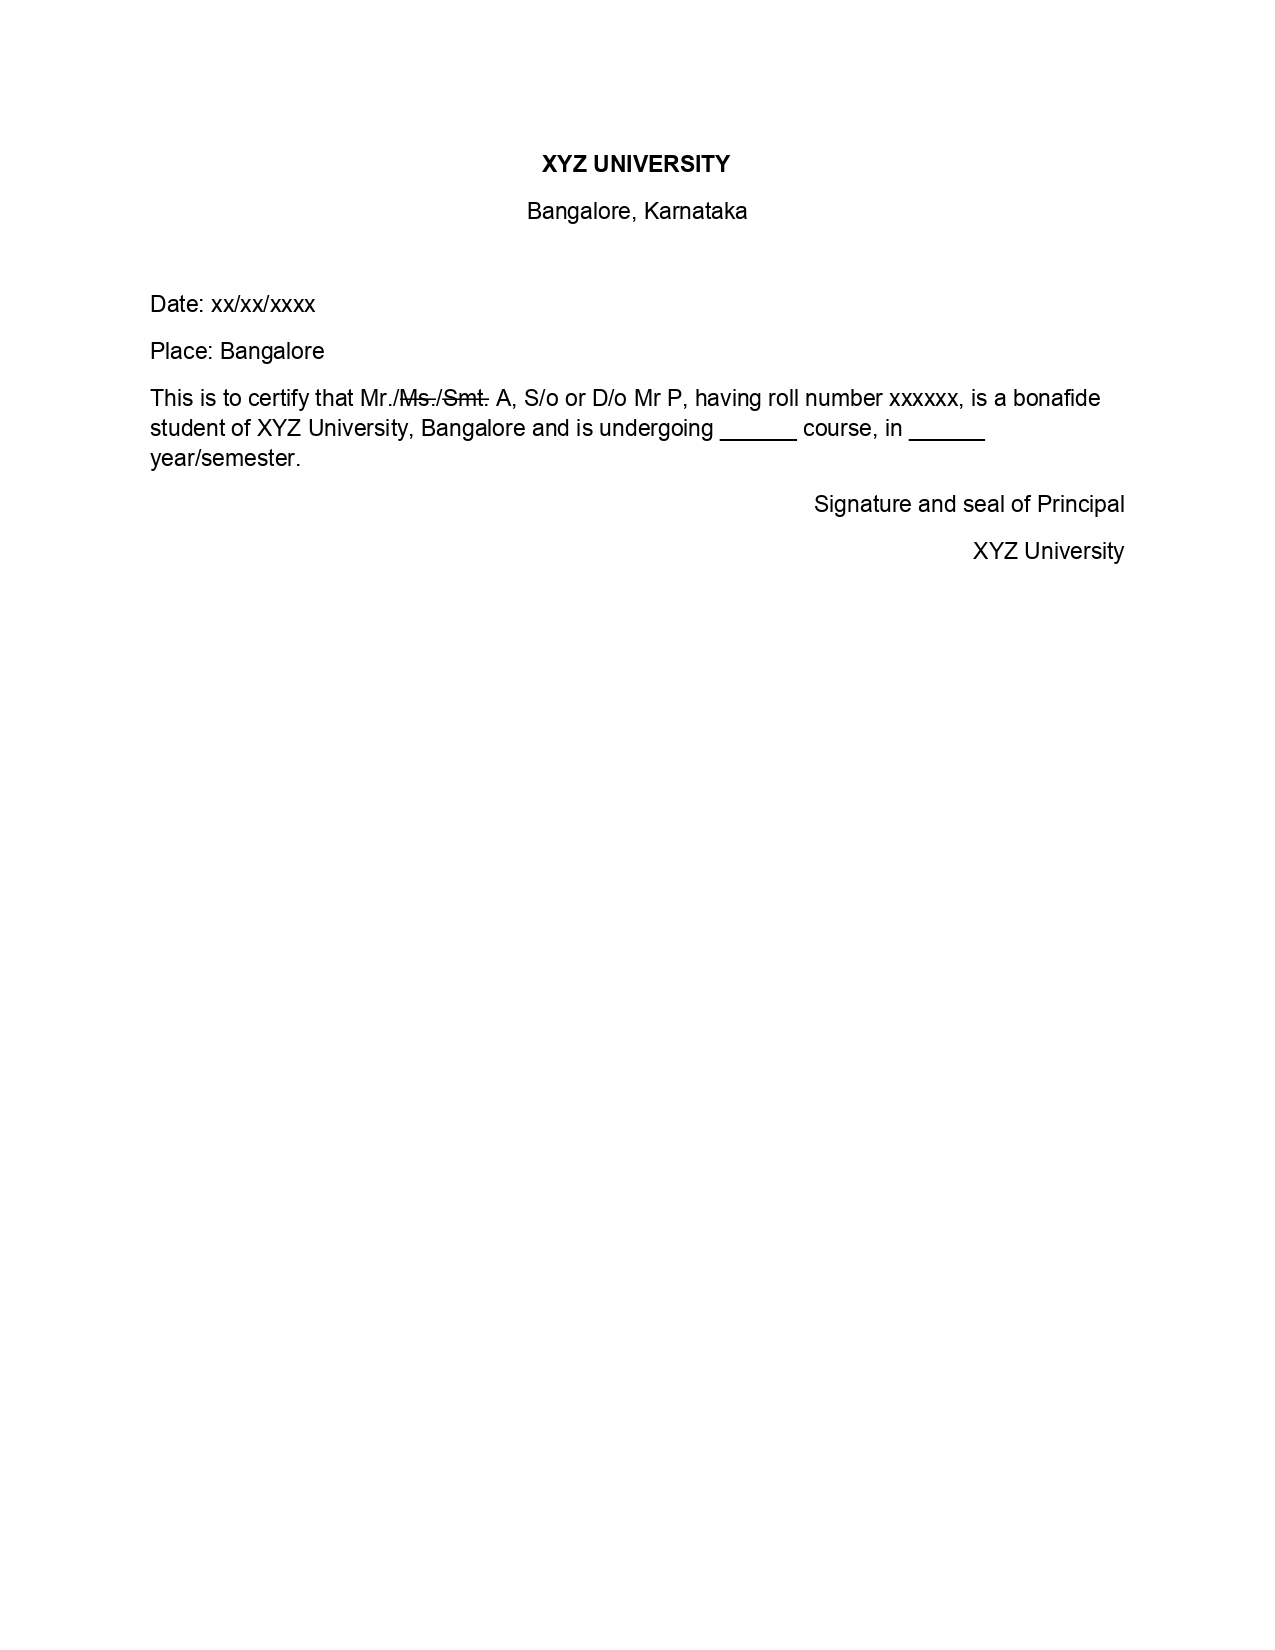 Bonafide Certificate Introduction Application Format